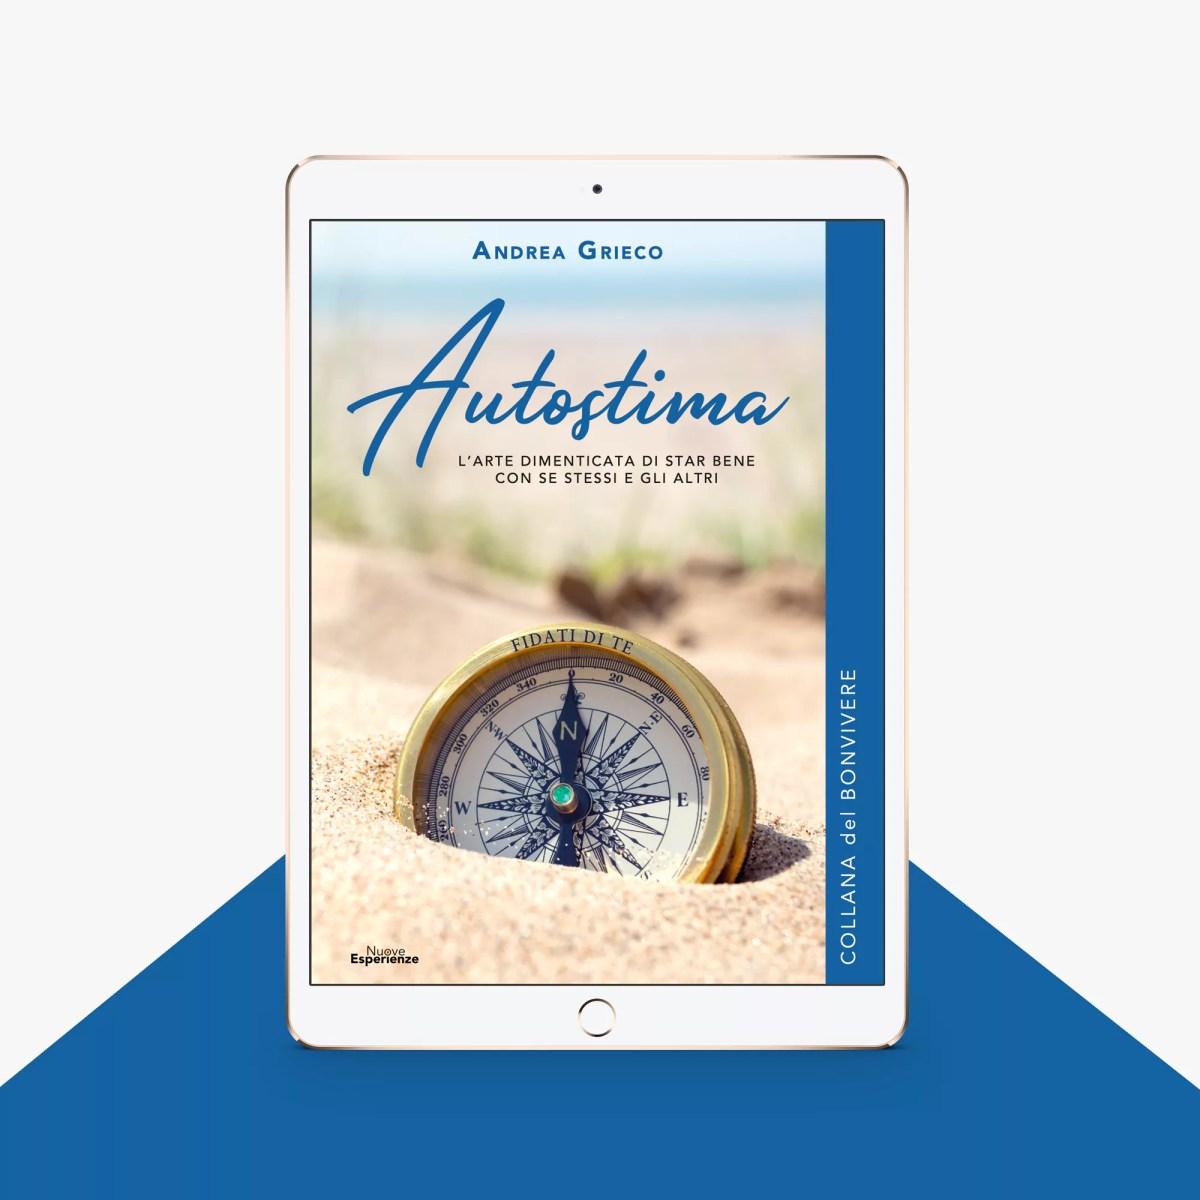 eBook Autostima Andrea Grieco